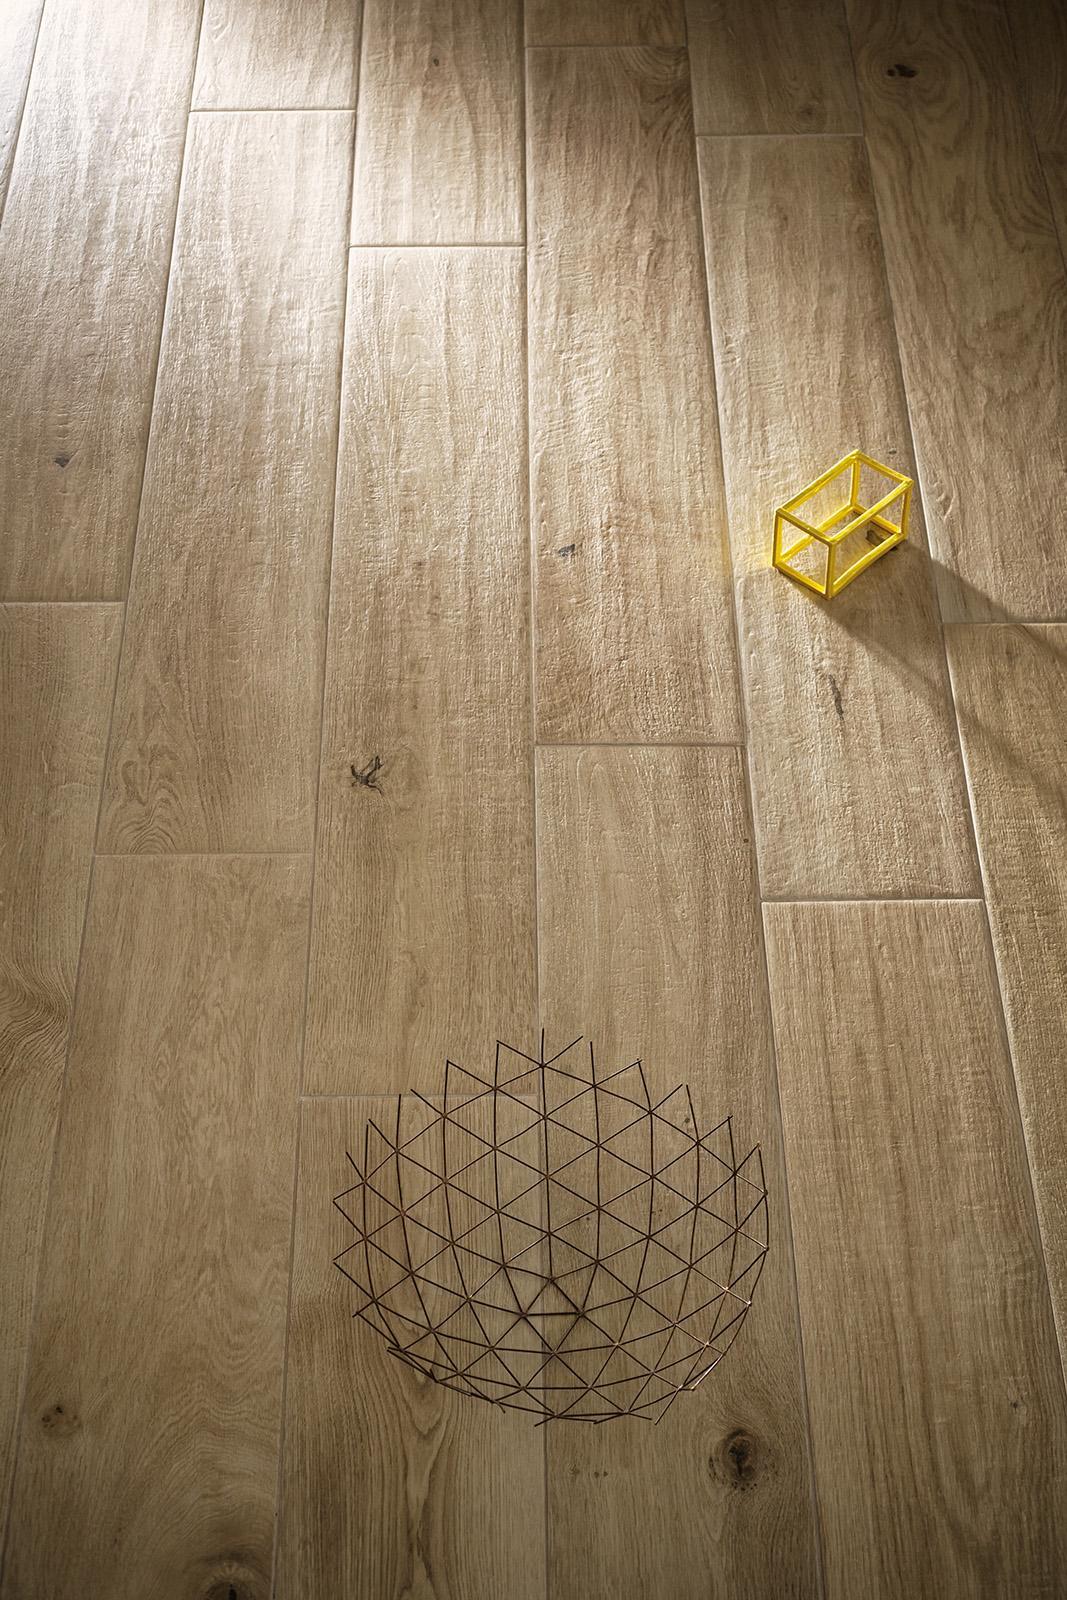 29 Amazing 2 1 4 Oak Hardwood Flooring 2021 free download 2 1 4 oak hardwood flooring of treverkever hard wood effect stoneware flooring marazzi with regard to treverkever wood effect bathroom